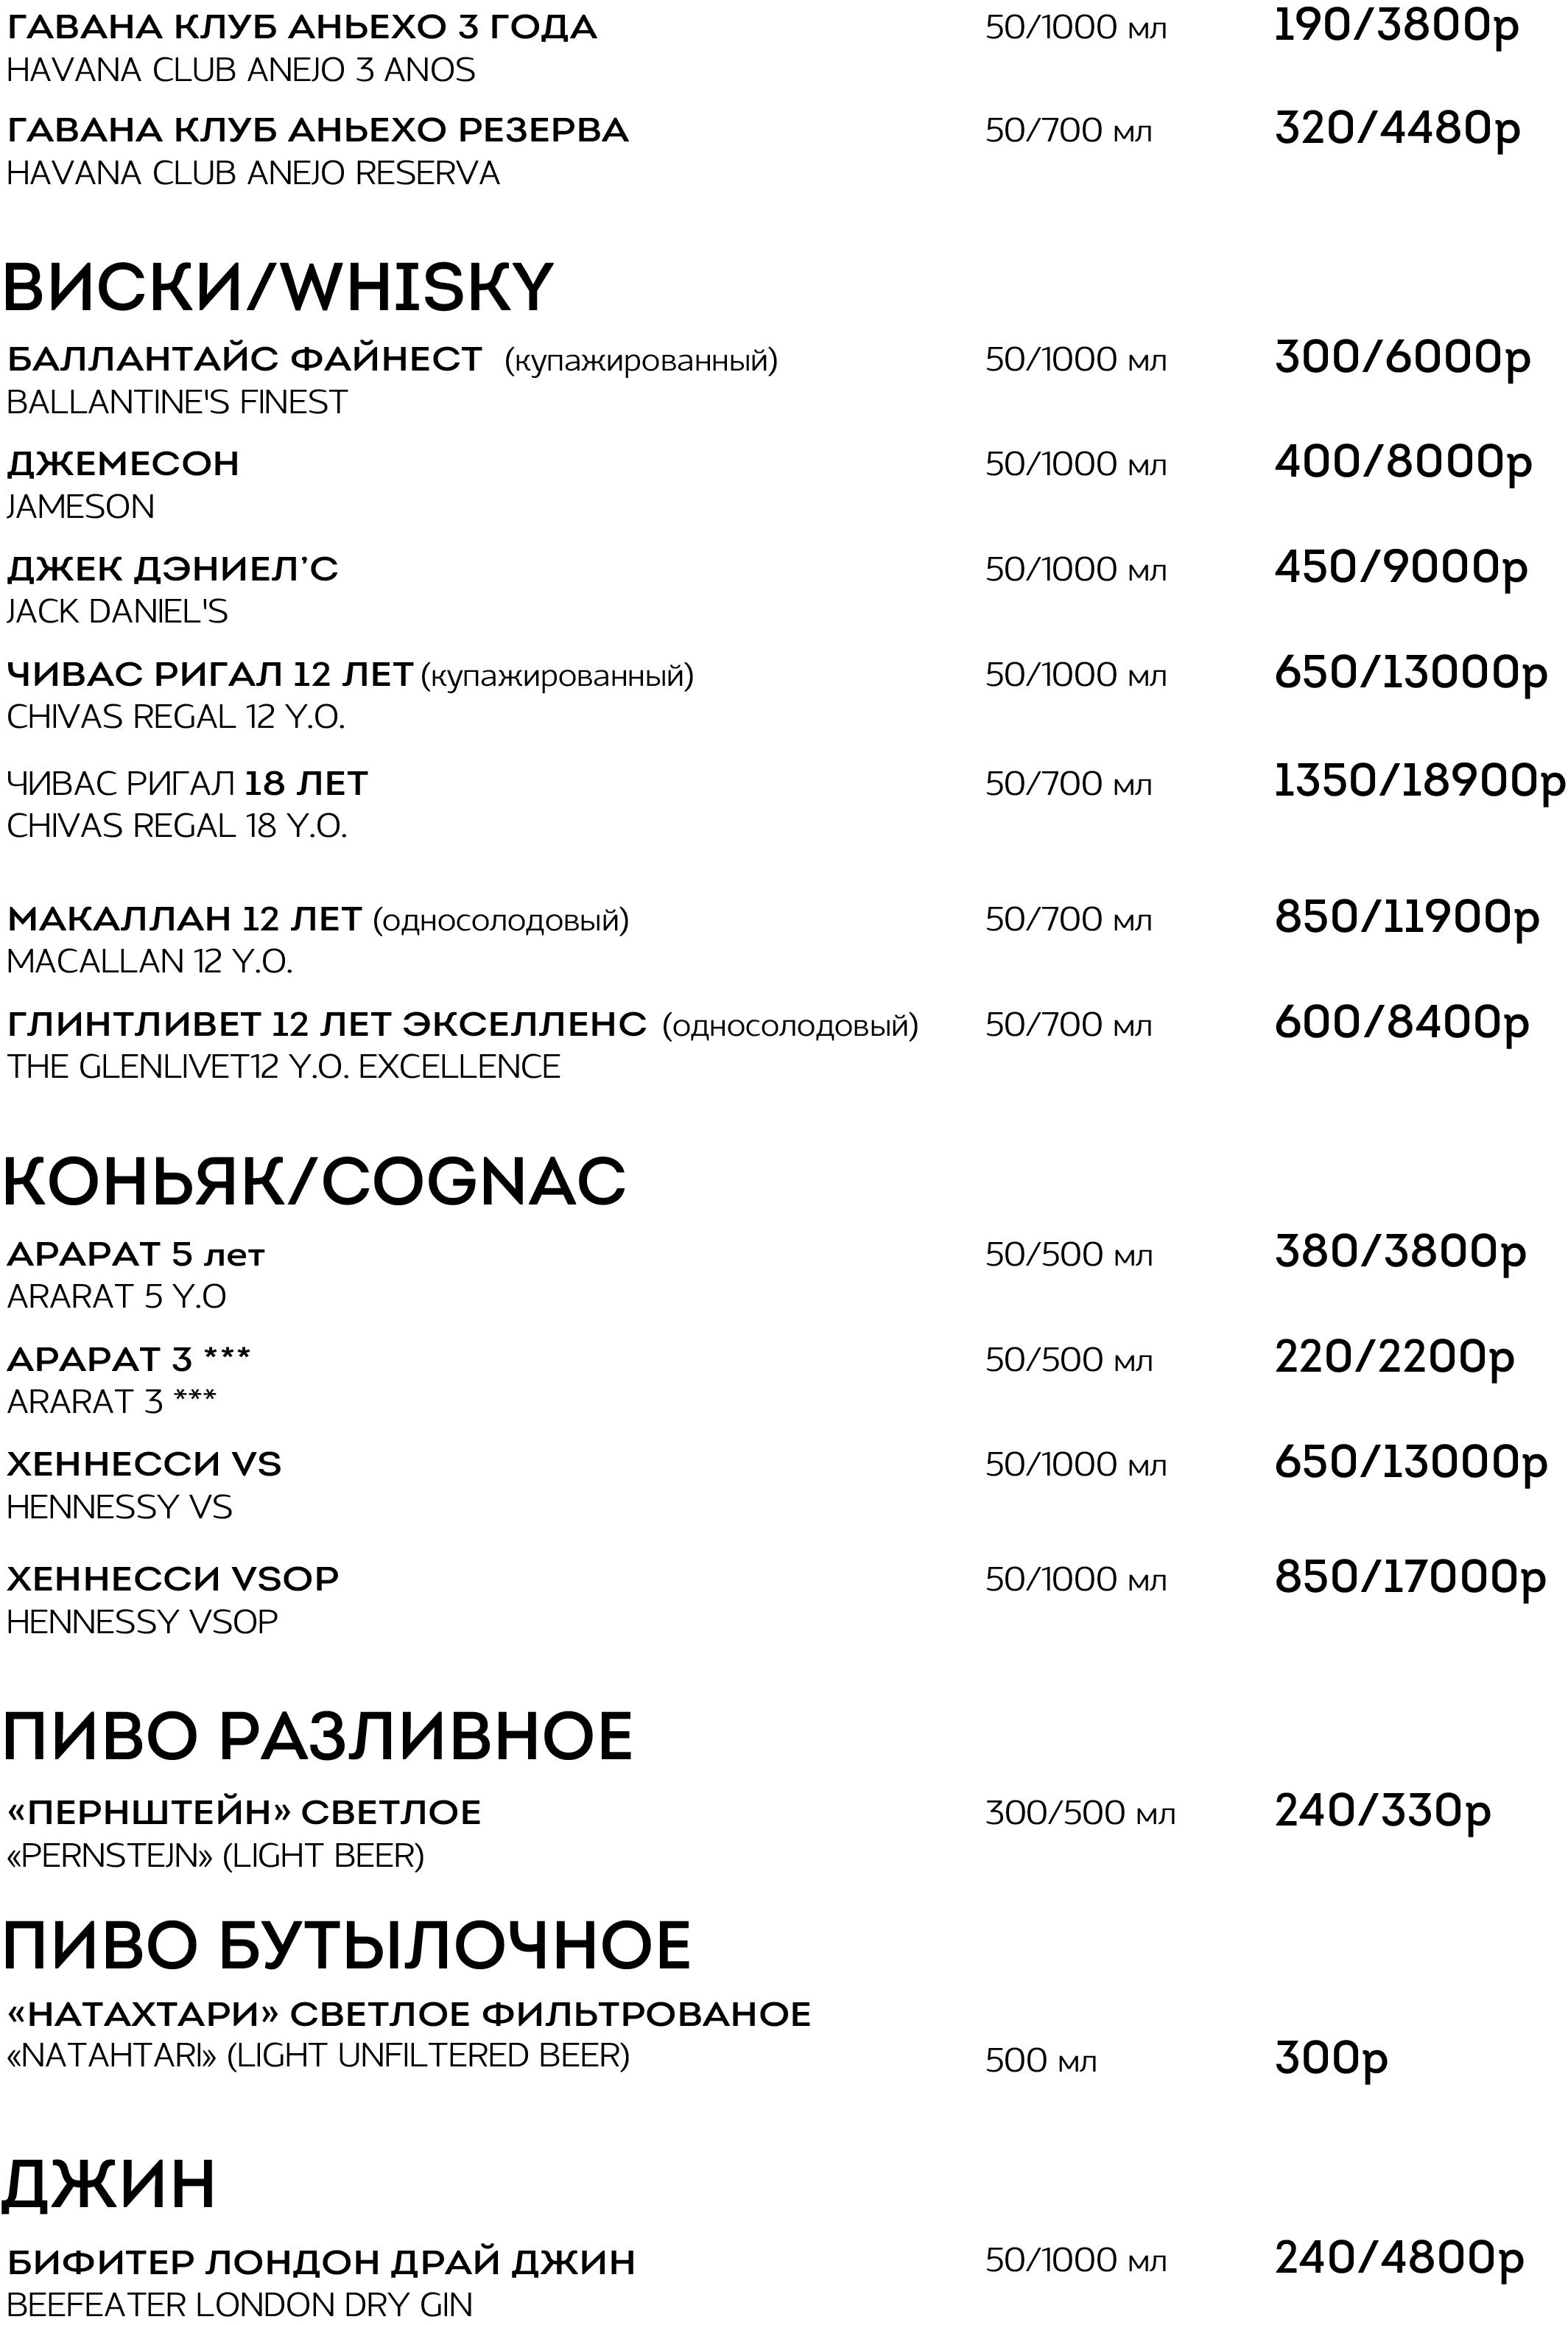 меню и бар 2019_Страница_17